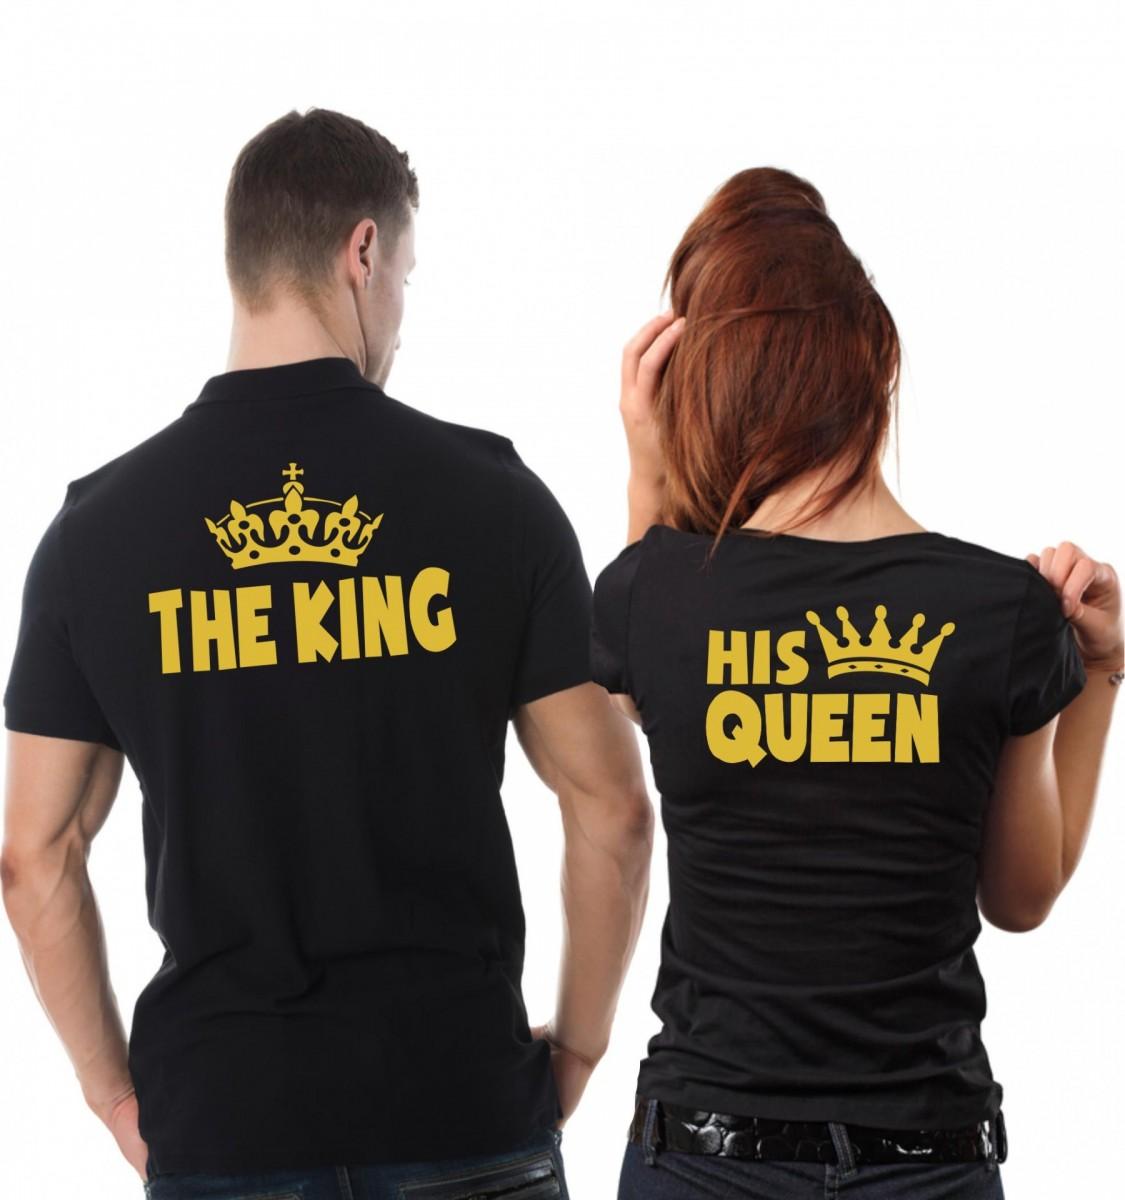 ae2183fd12e Partnerské trička - Pánské The King + Dámské His queen (dámské + pánské  tričko)